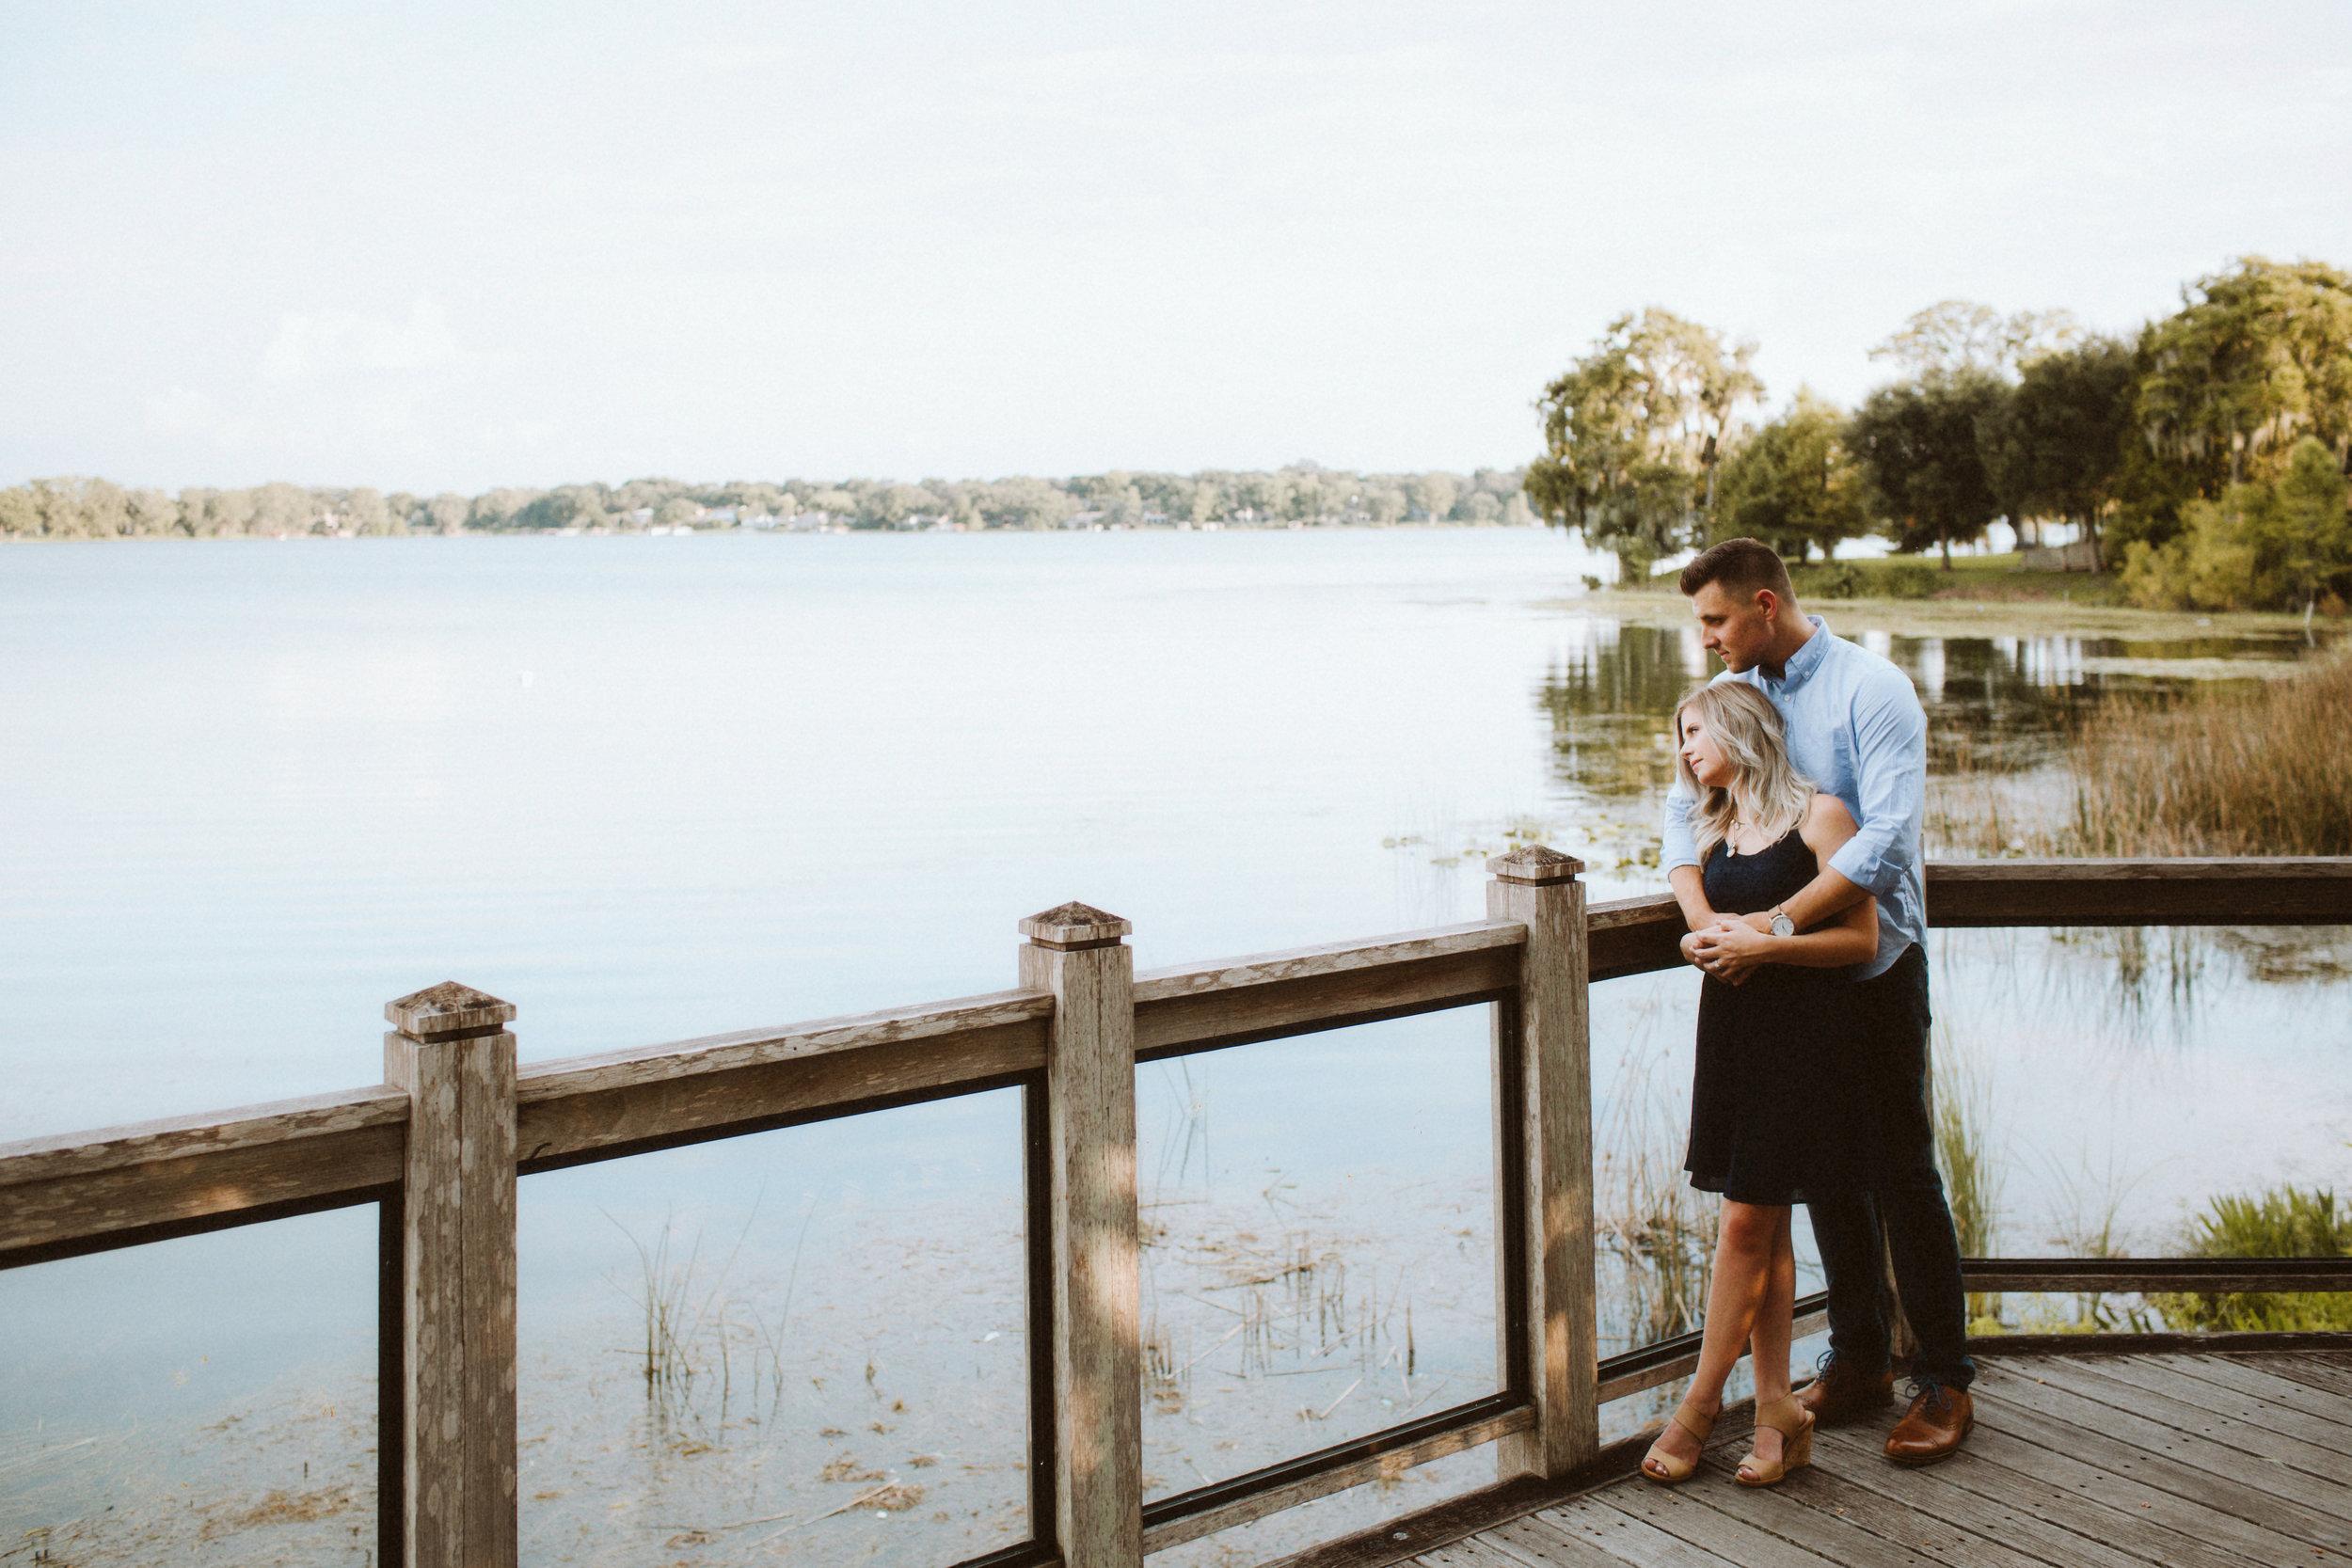 Engagement | Vanessa Boy Photography | vanessaboy.com |-51-2.com |final .jpg